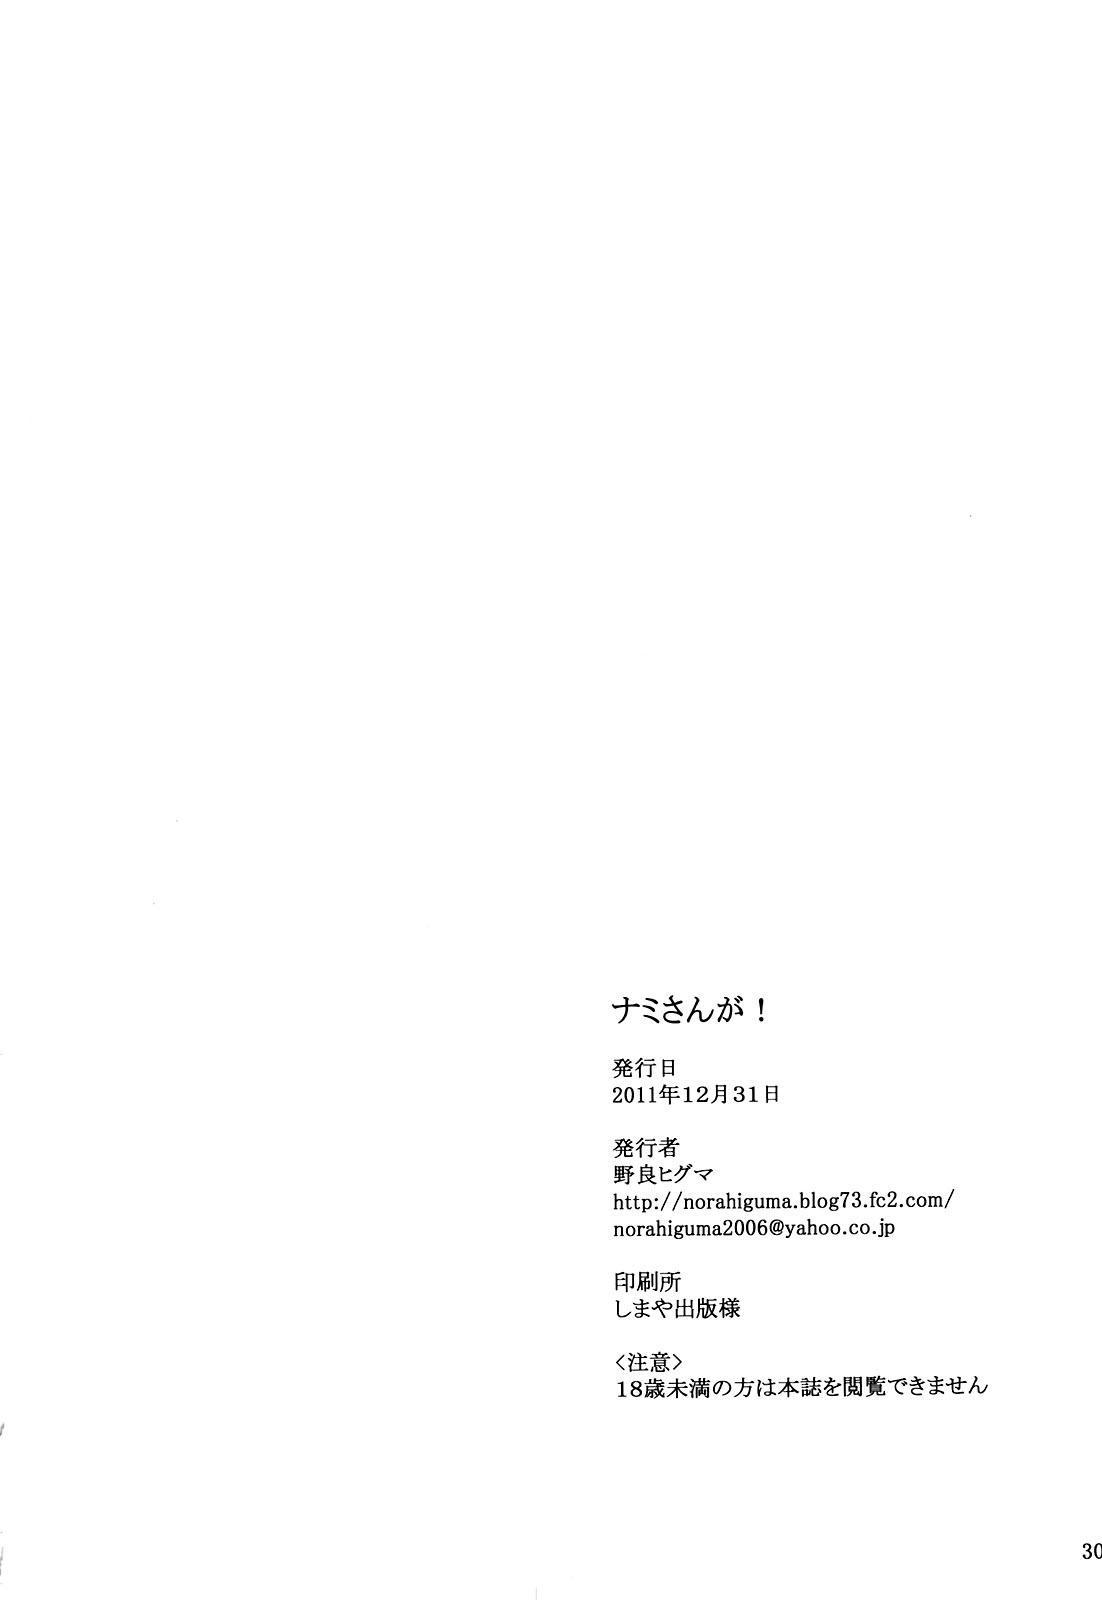 (C81) [Higuma-ya (Nora Higuma)] Nami-san ga! | Nami-san is! (One Piece) [English] {doujin-moe.us} 28